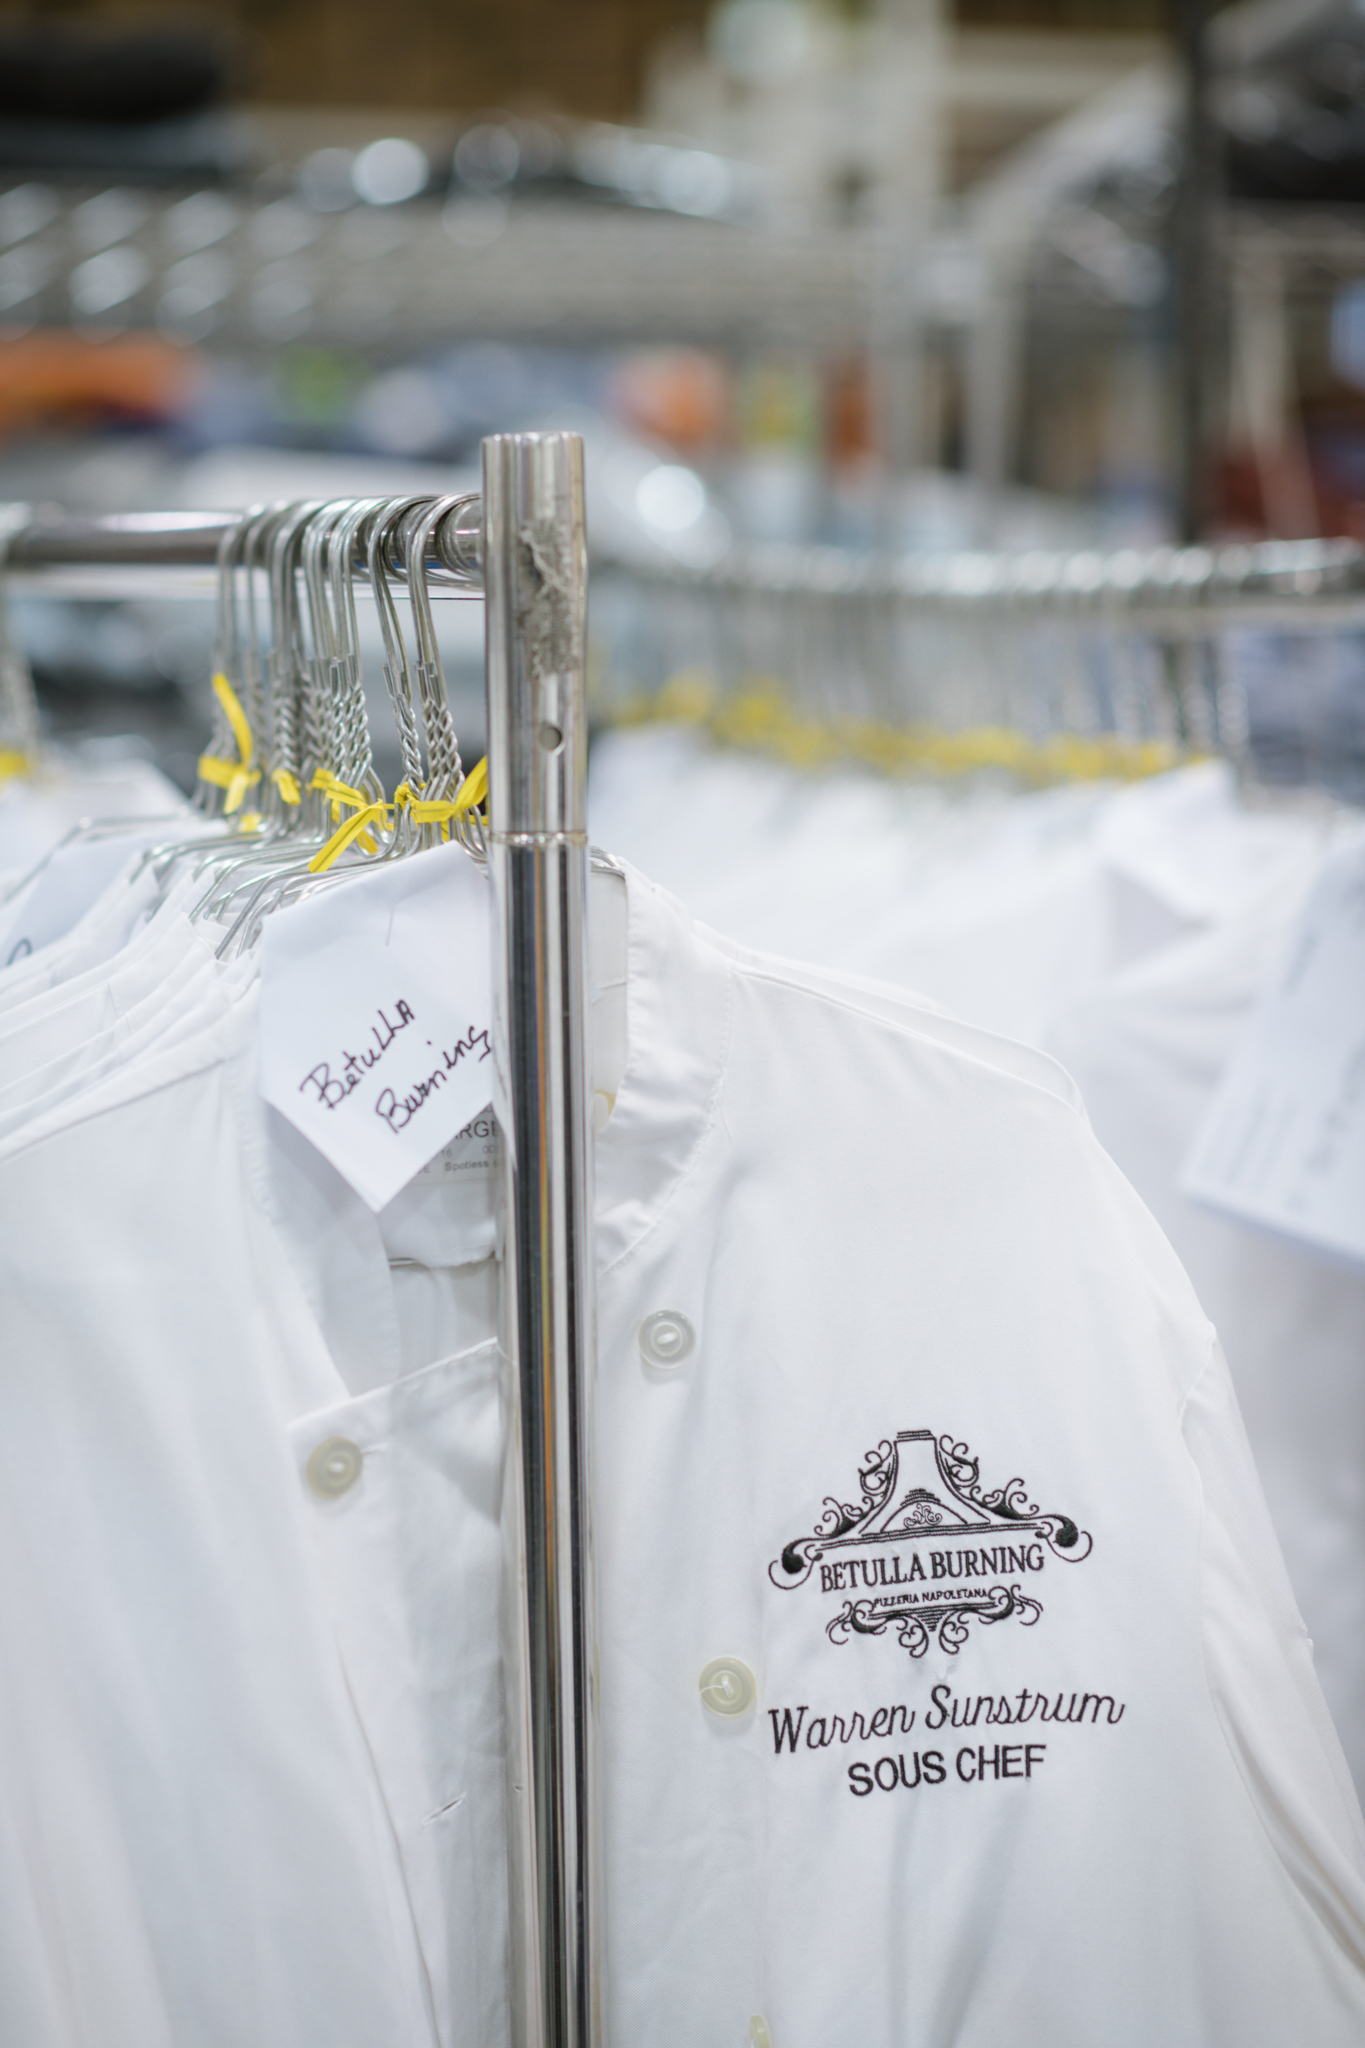 Spotless Uniform Ltd in PRINCE GEORGE